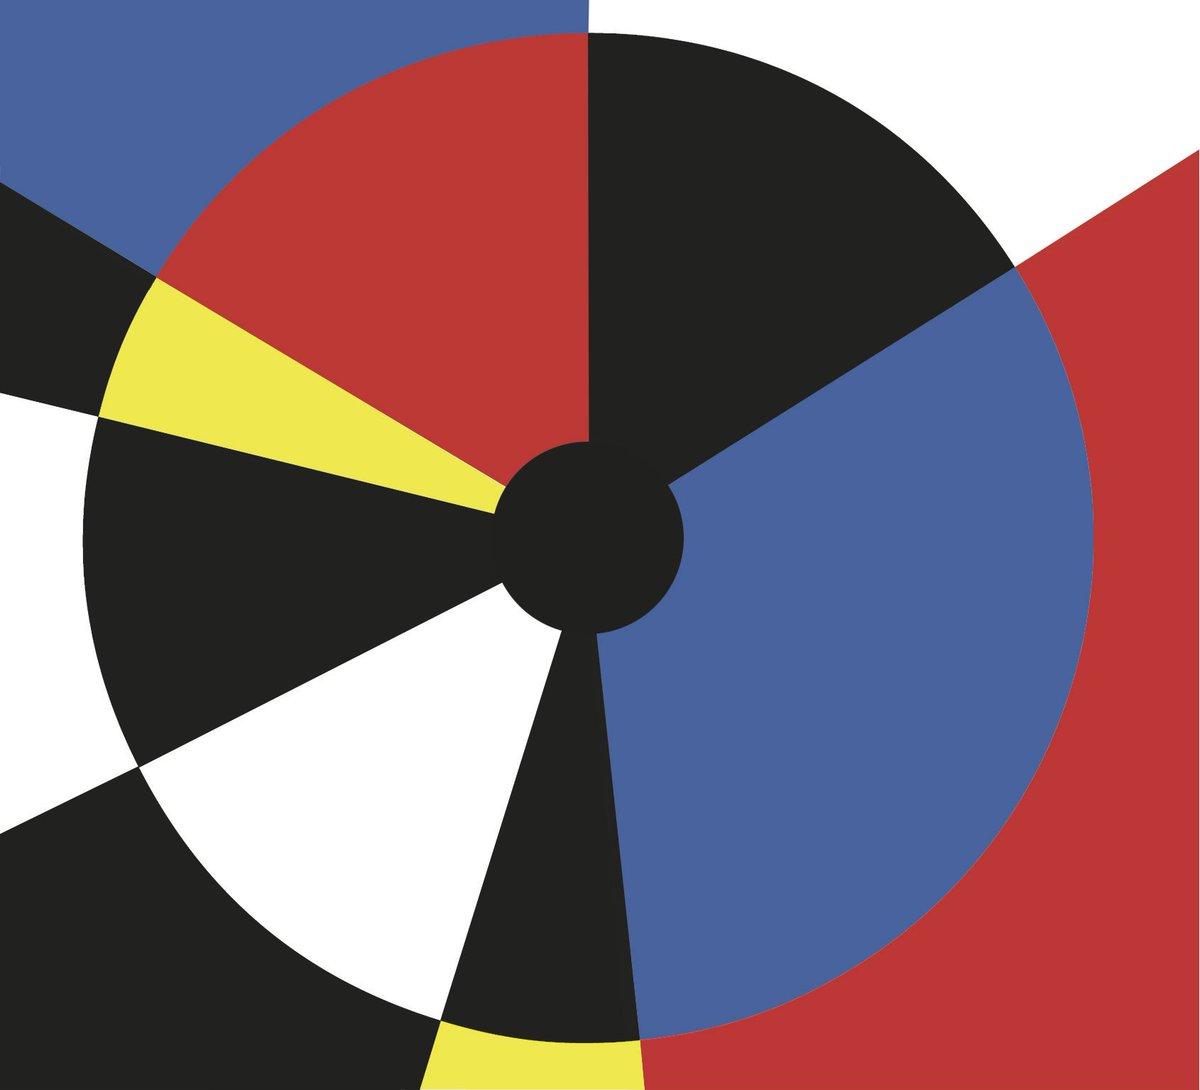 New Blancmange album, Commuter 23 & UK Tour in March '16. Support from @bernholzmusic  https://t.co/BaRDRW17cg https://t.co/pv6ZDV5YXw